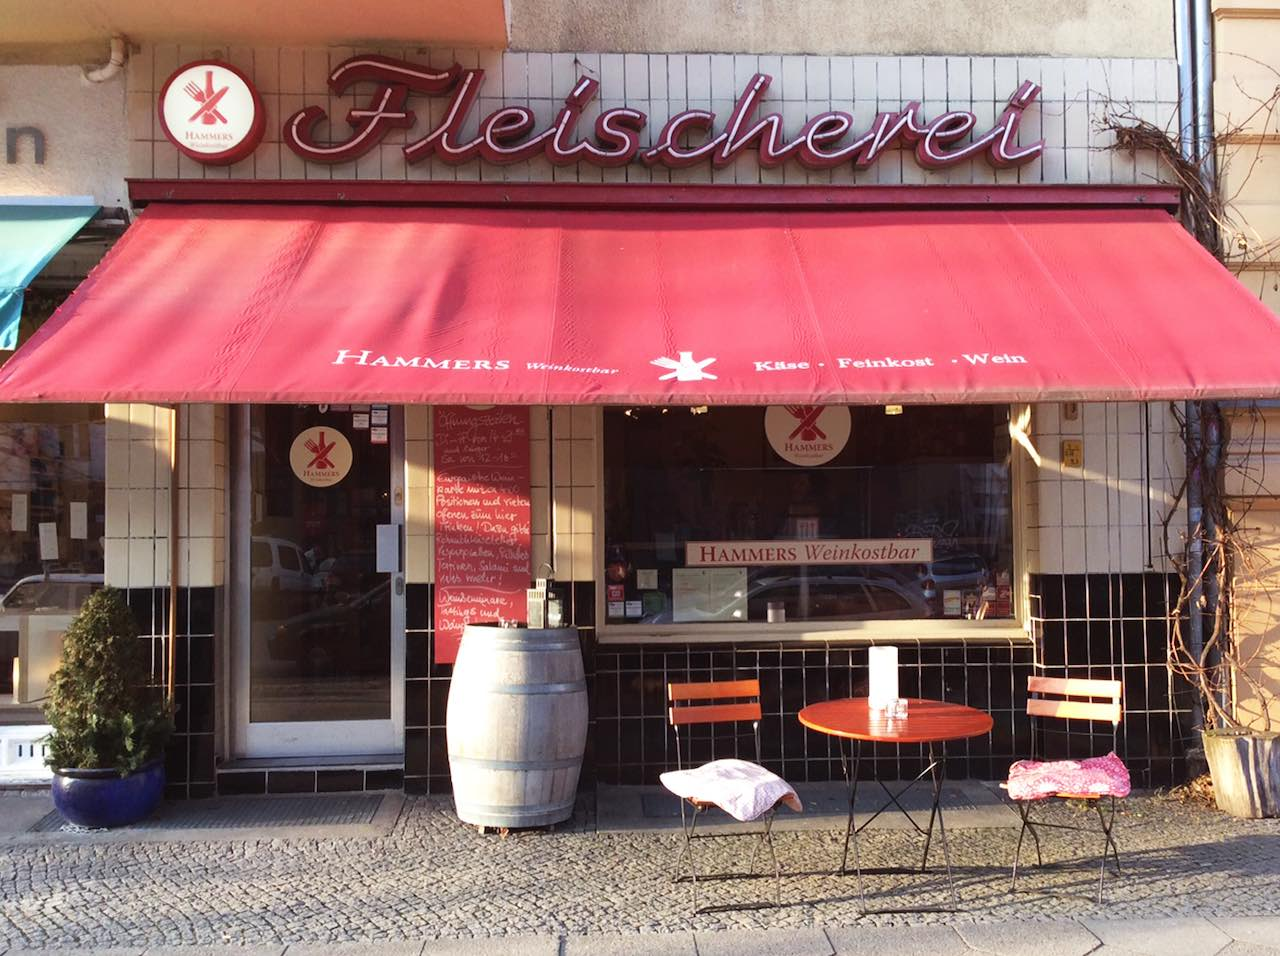 Hammers Weinkostbar Berlin